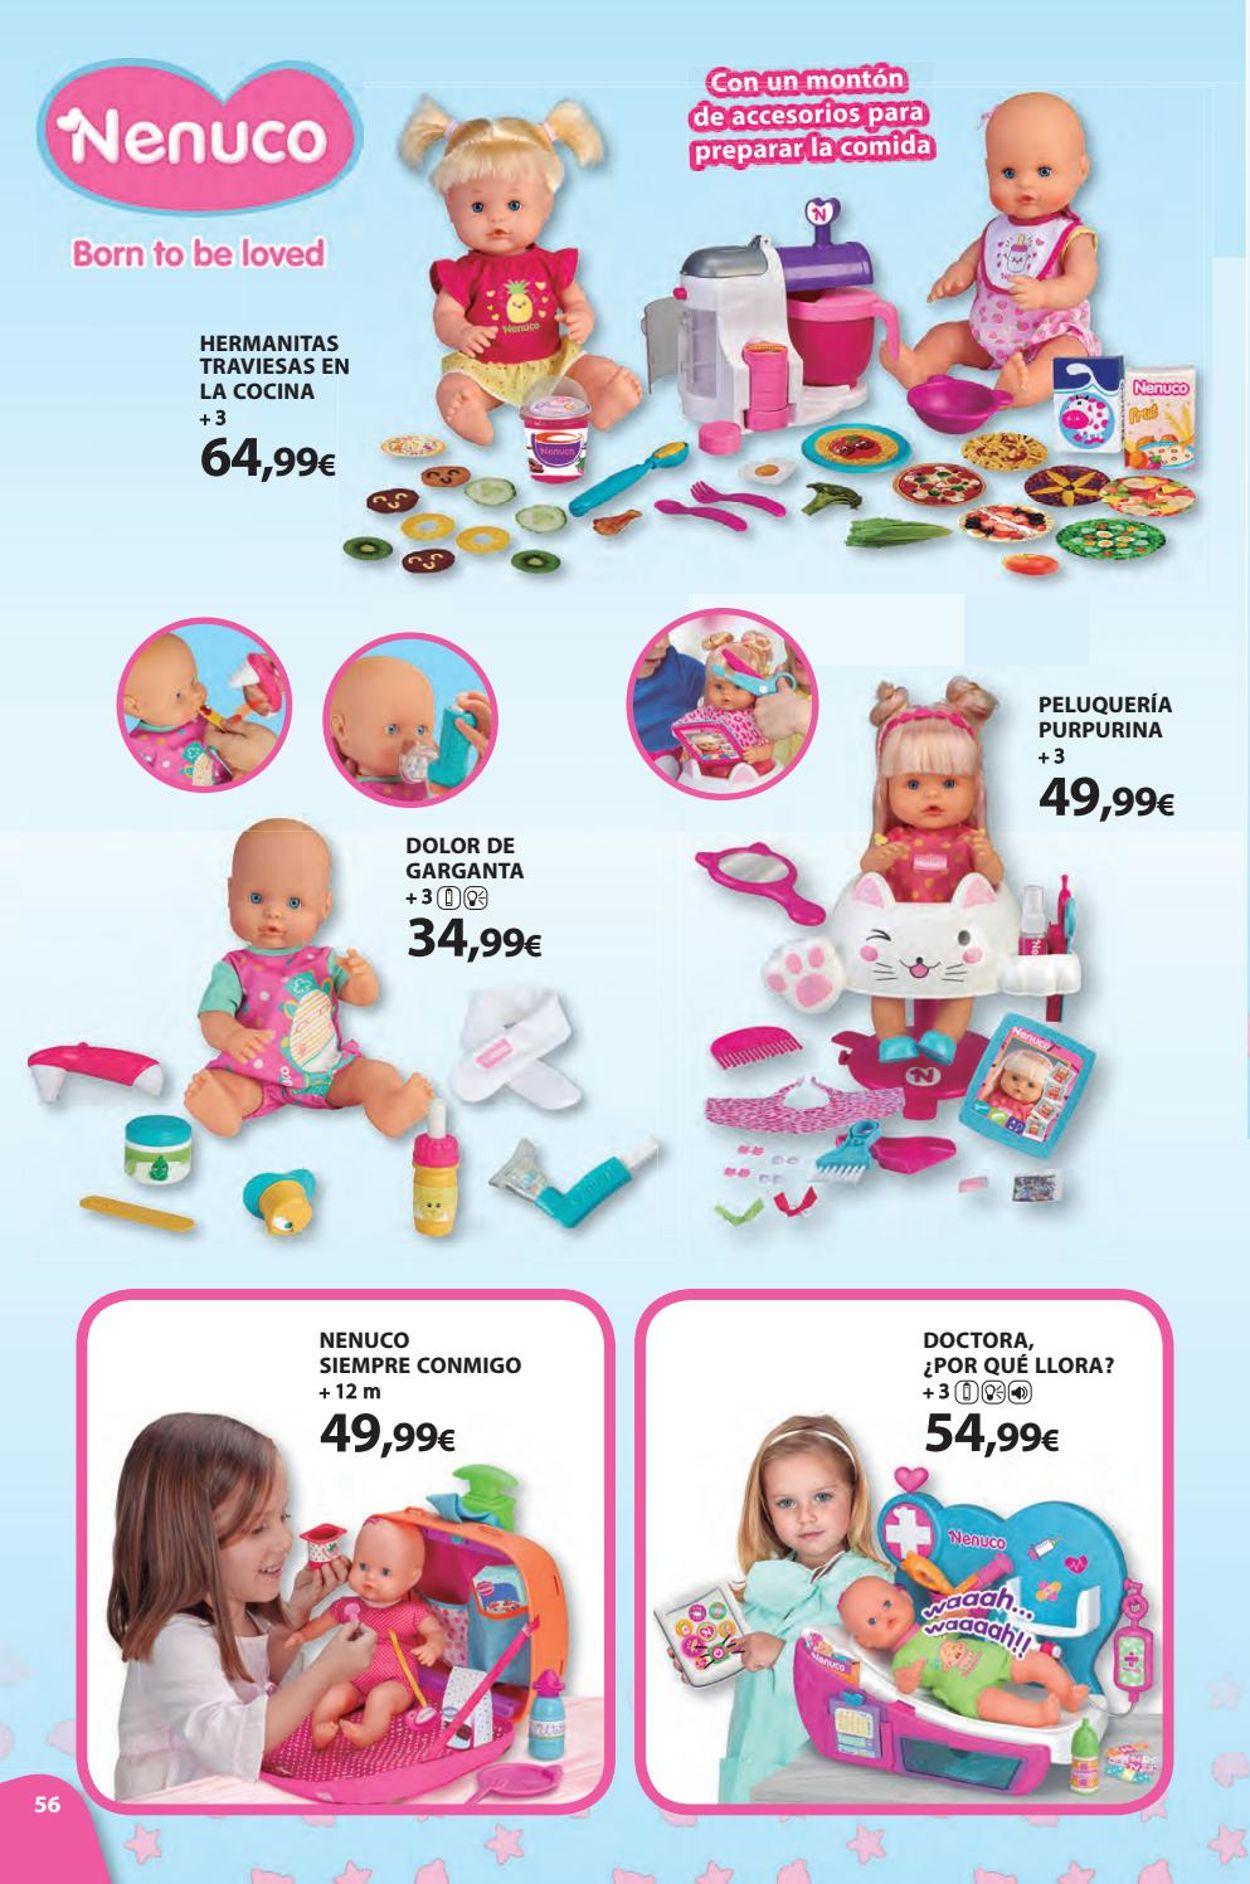 Toy Planet Folleto - 08.11-24.12.2019 (Página 56)